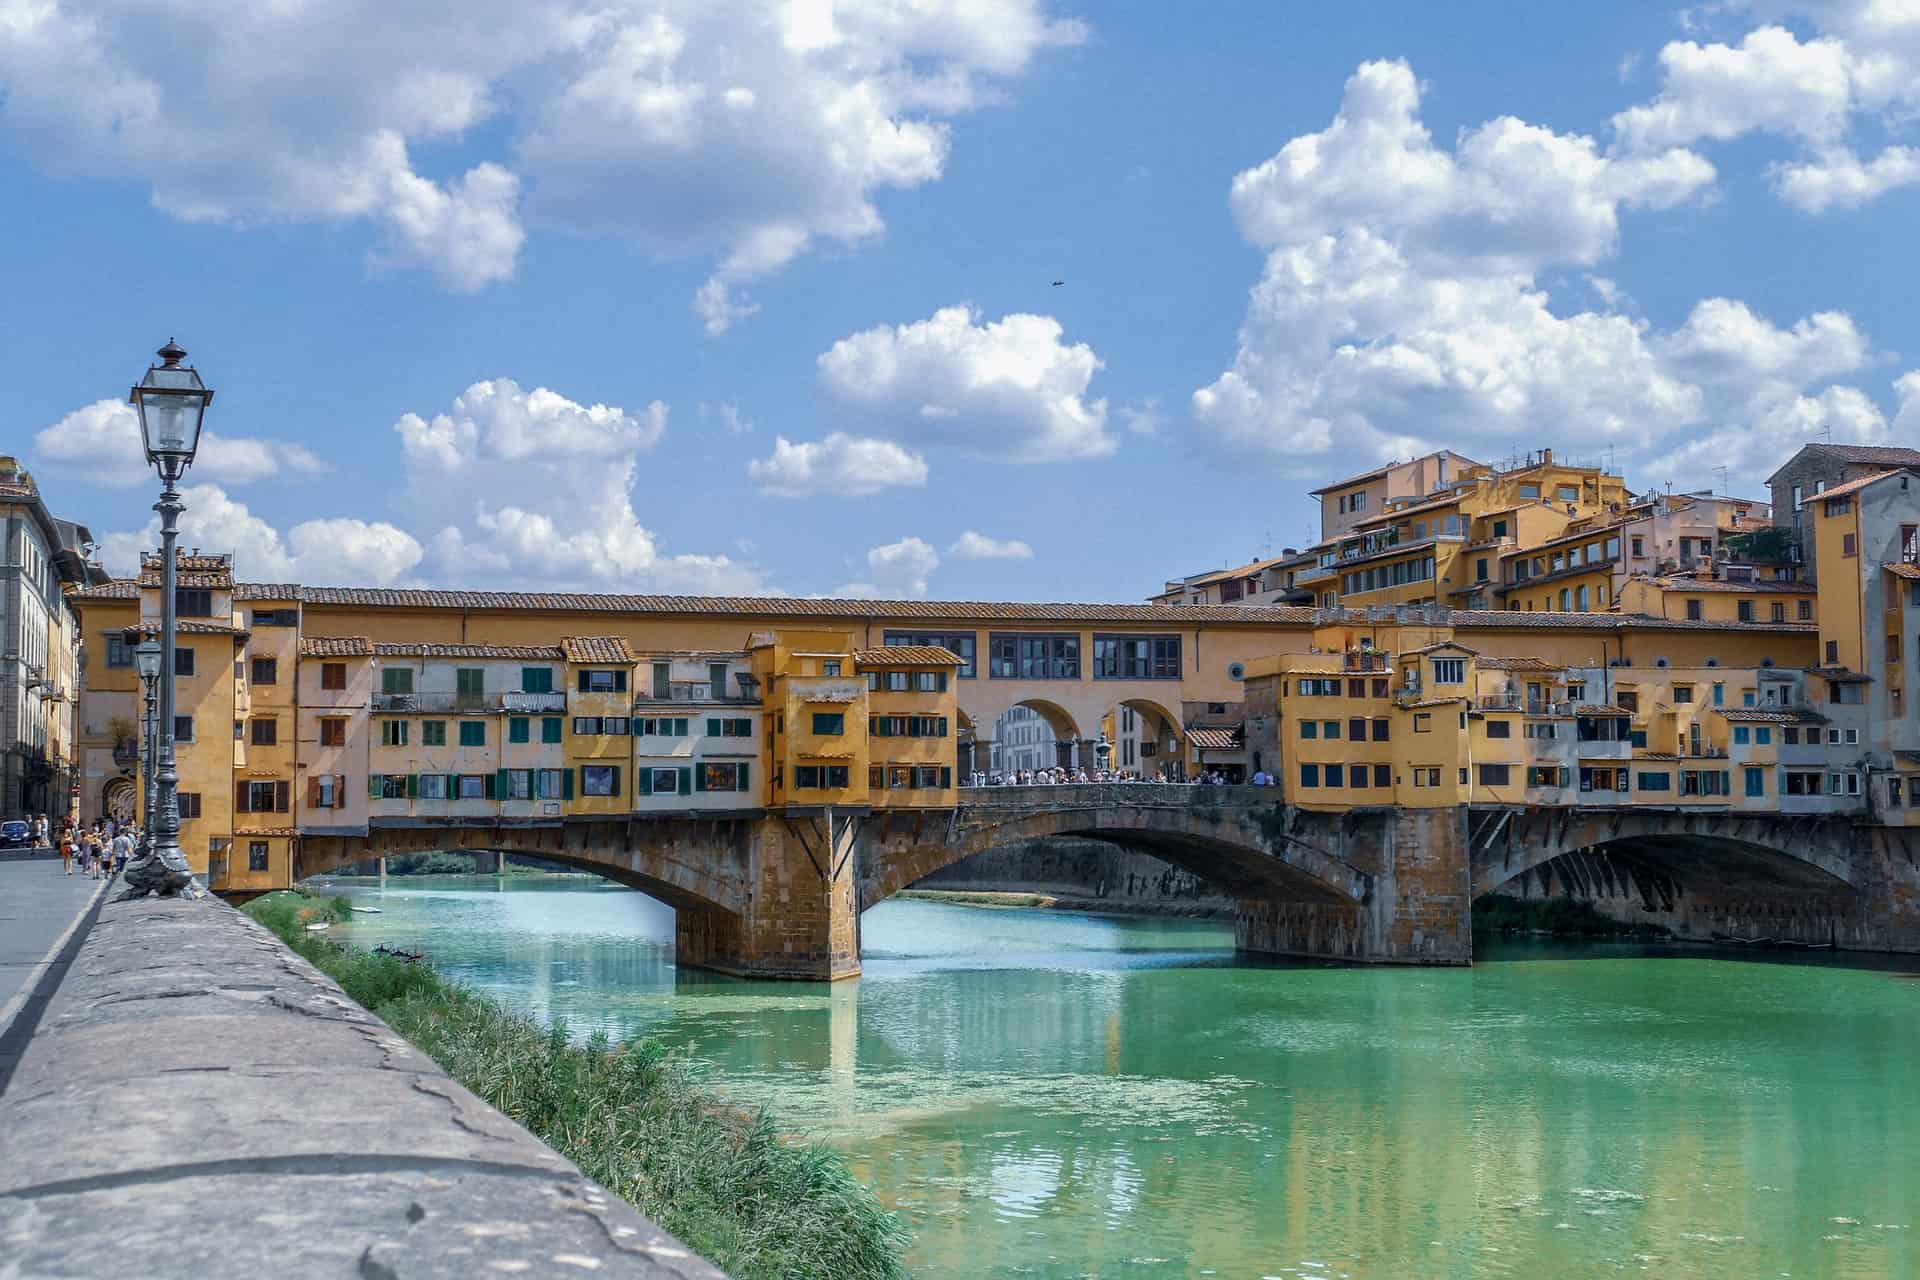 Florenz Camping Urlaub in der Toskana